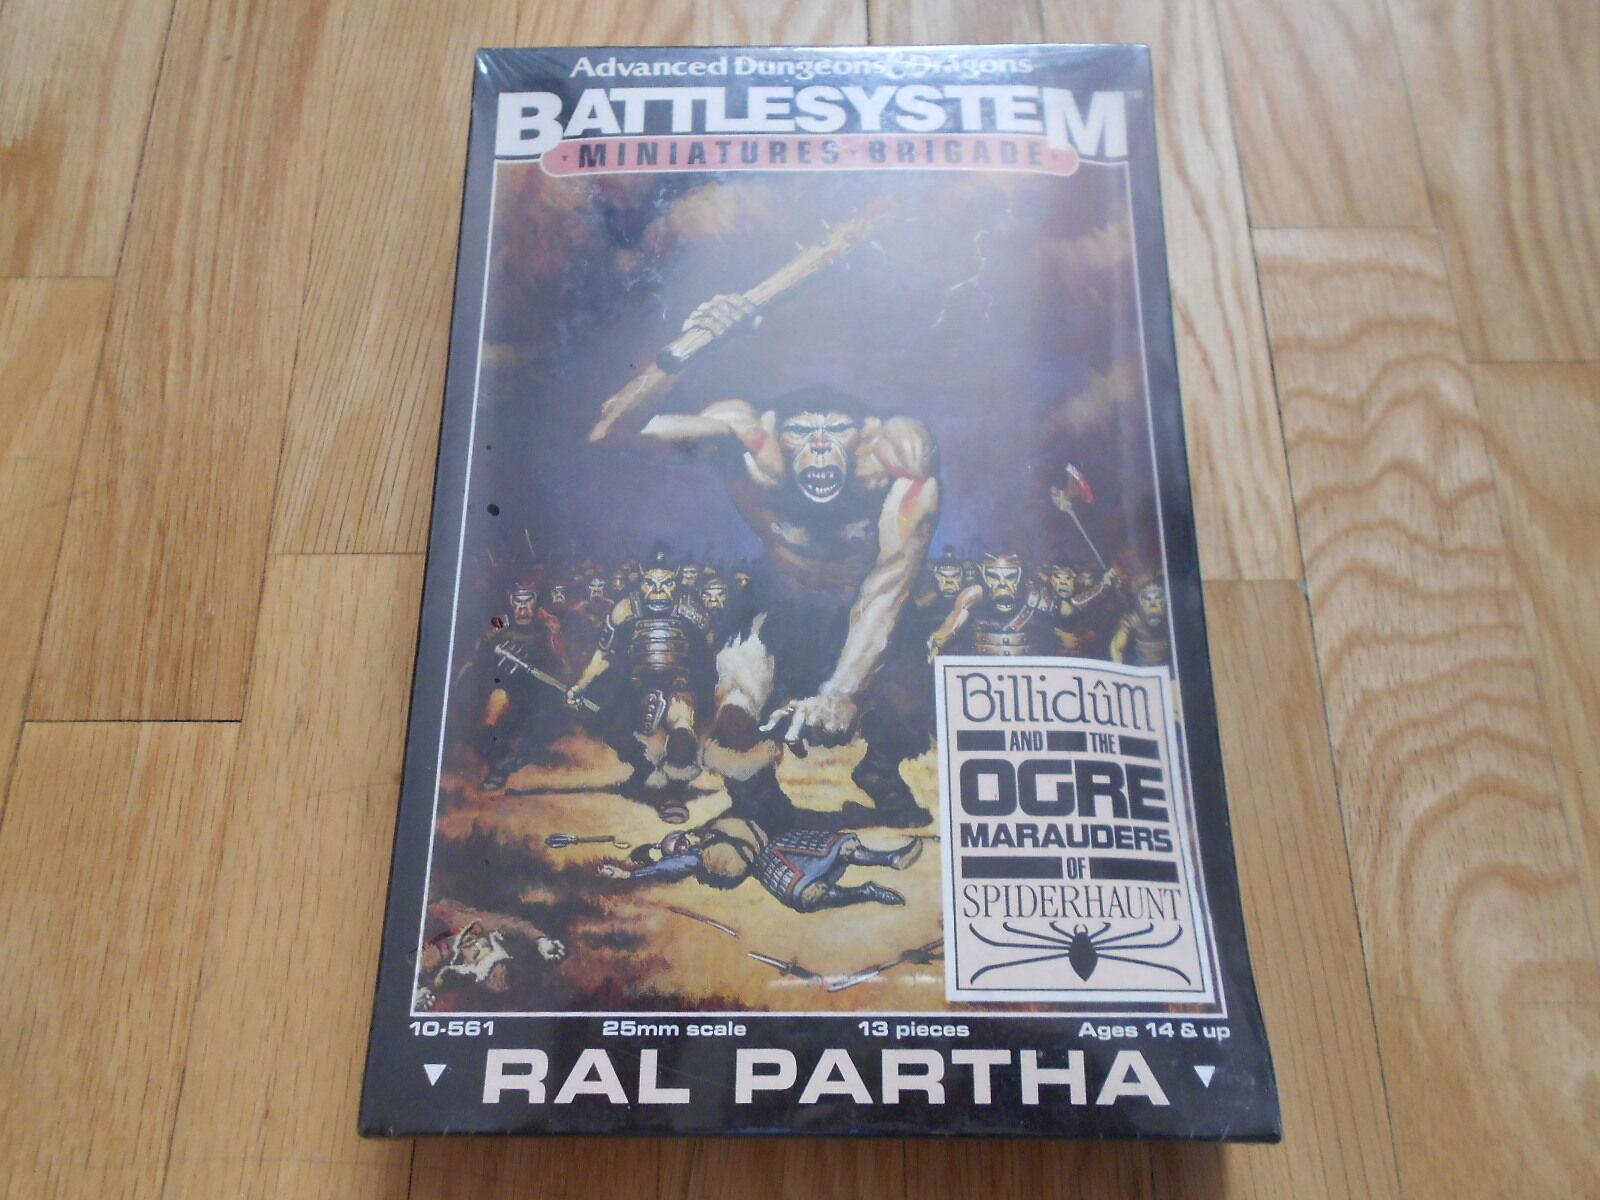 Battlesystem Ad&d -  Billidum - Ral Partha 10-561 - Miniatures Brigade  les clients d'abord